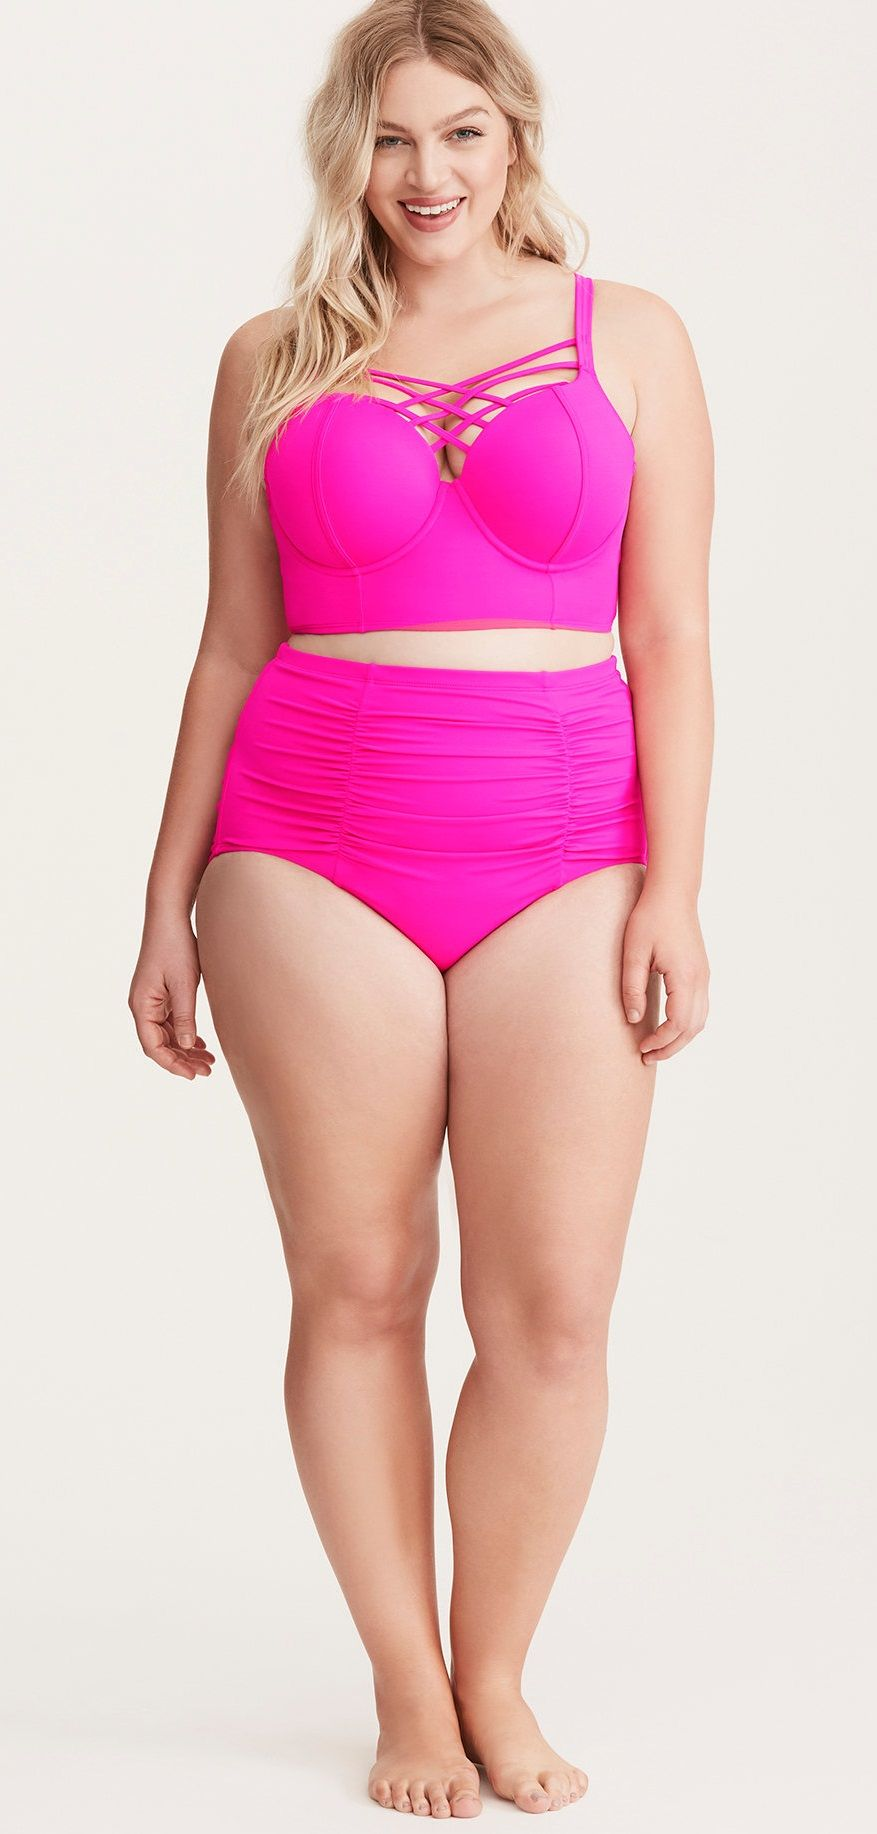 Plus Size Bikini Swimsuit   Plus Size Fashion   Pinterest   Ropa ...